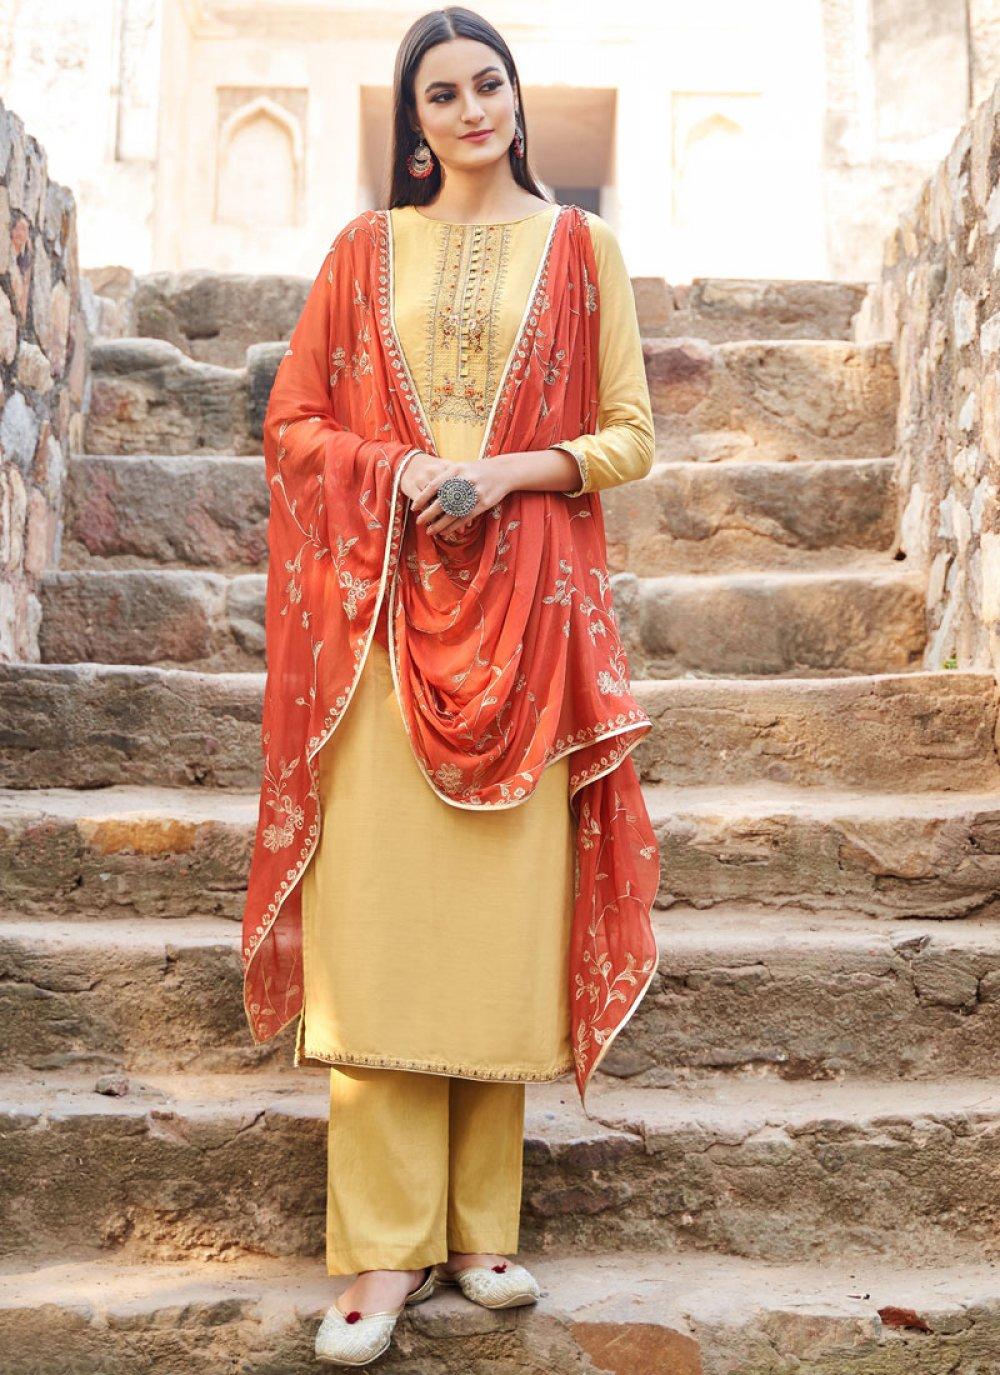 Muslin Embroidered Designer Salwar kameez in Yellow